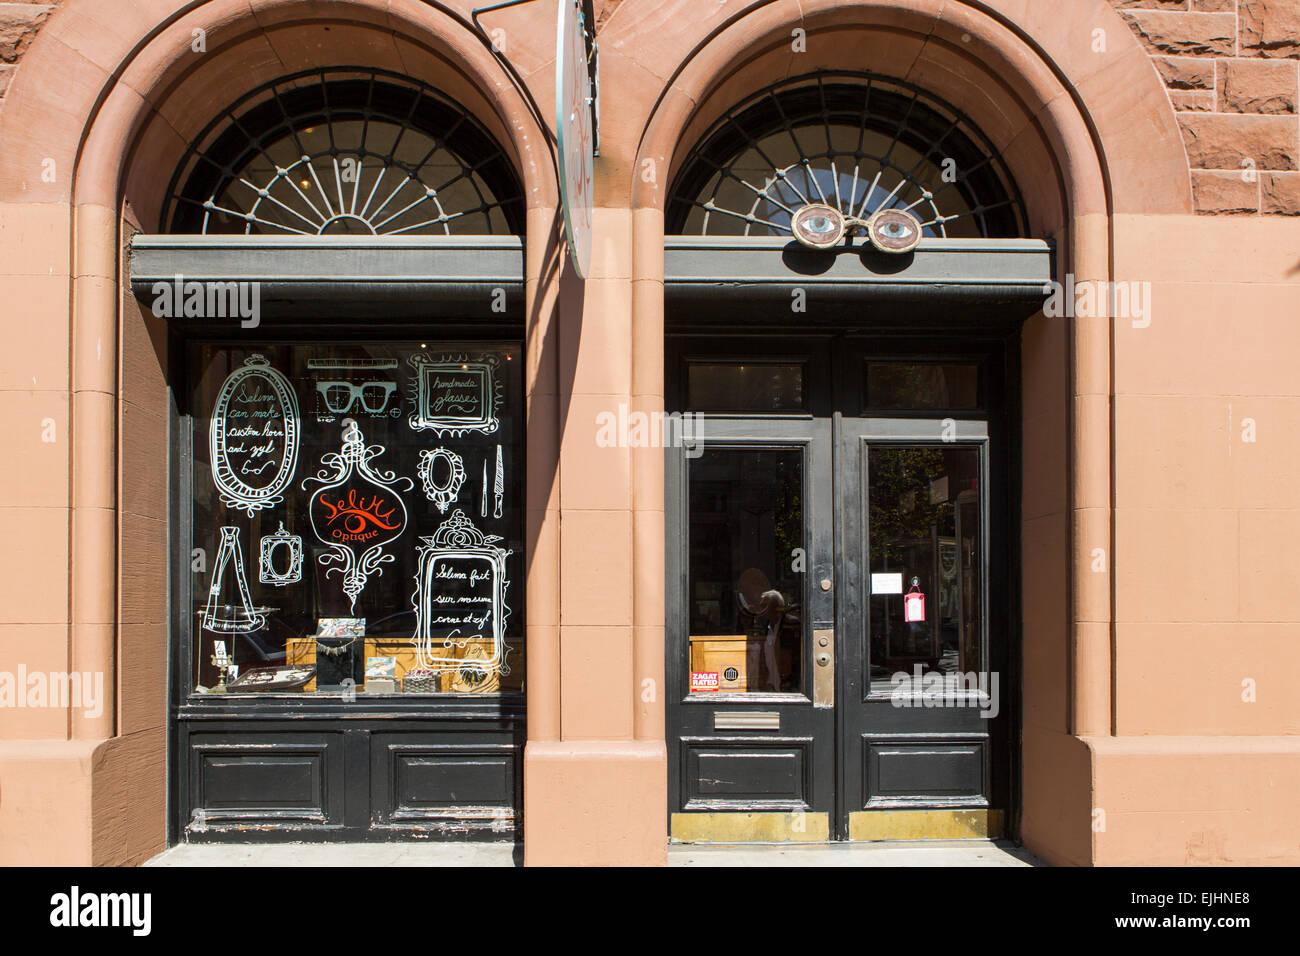 Handmade glasses shop in SoHo, New York City, USA - Stock Image